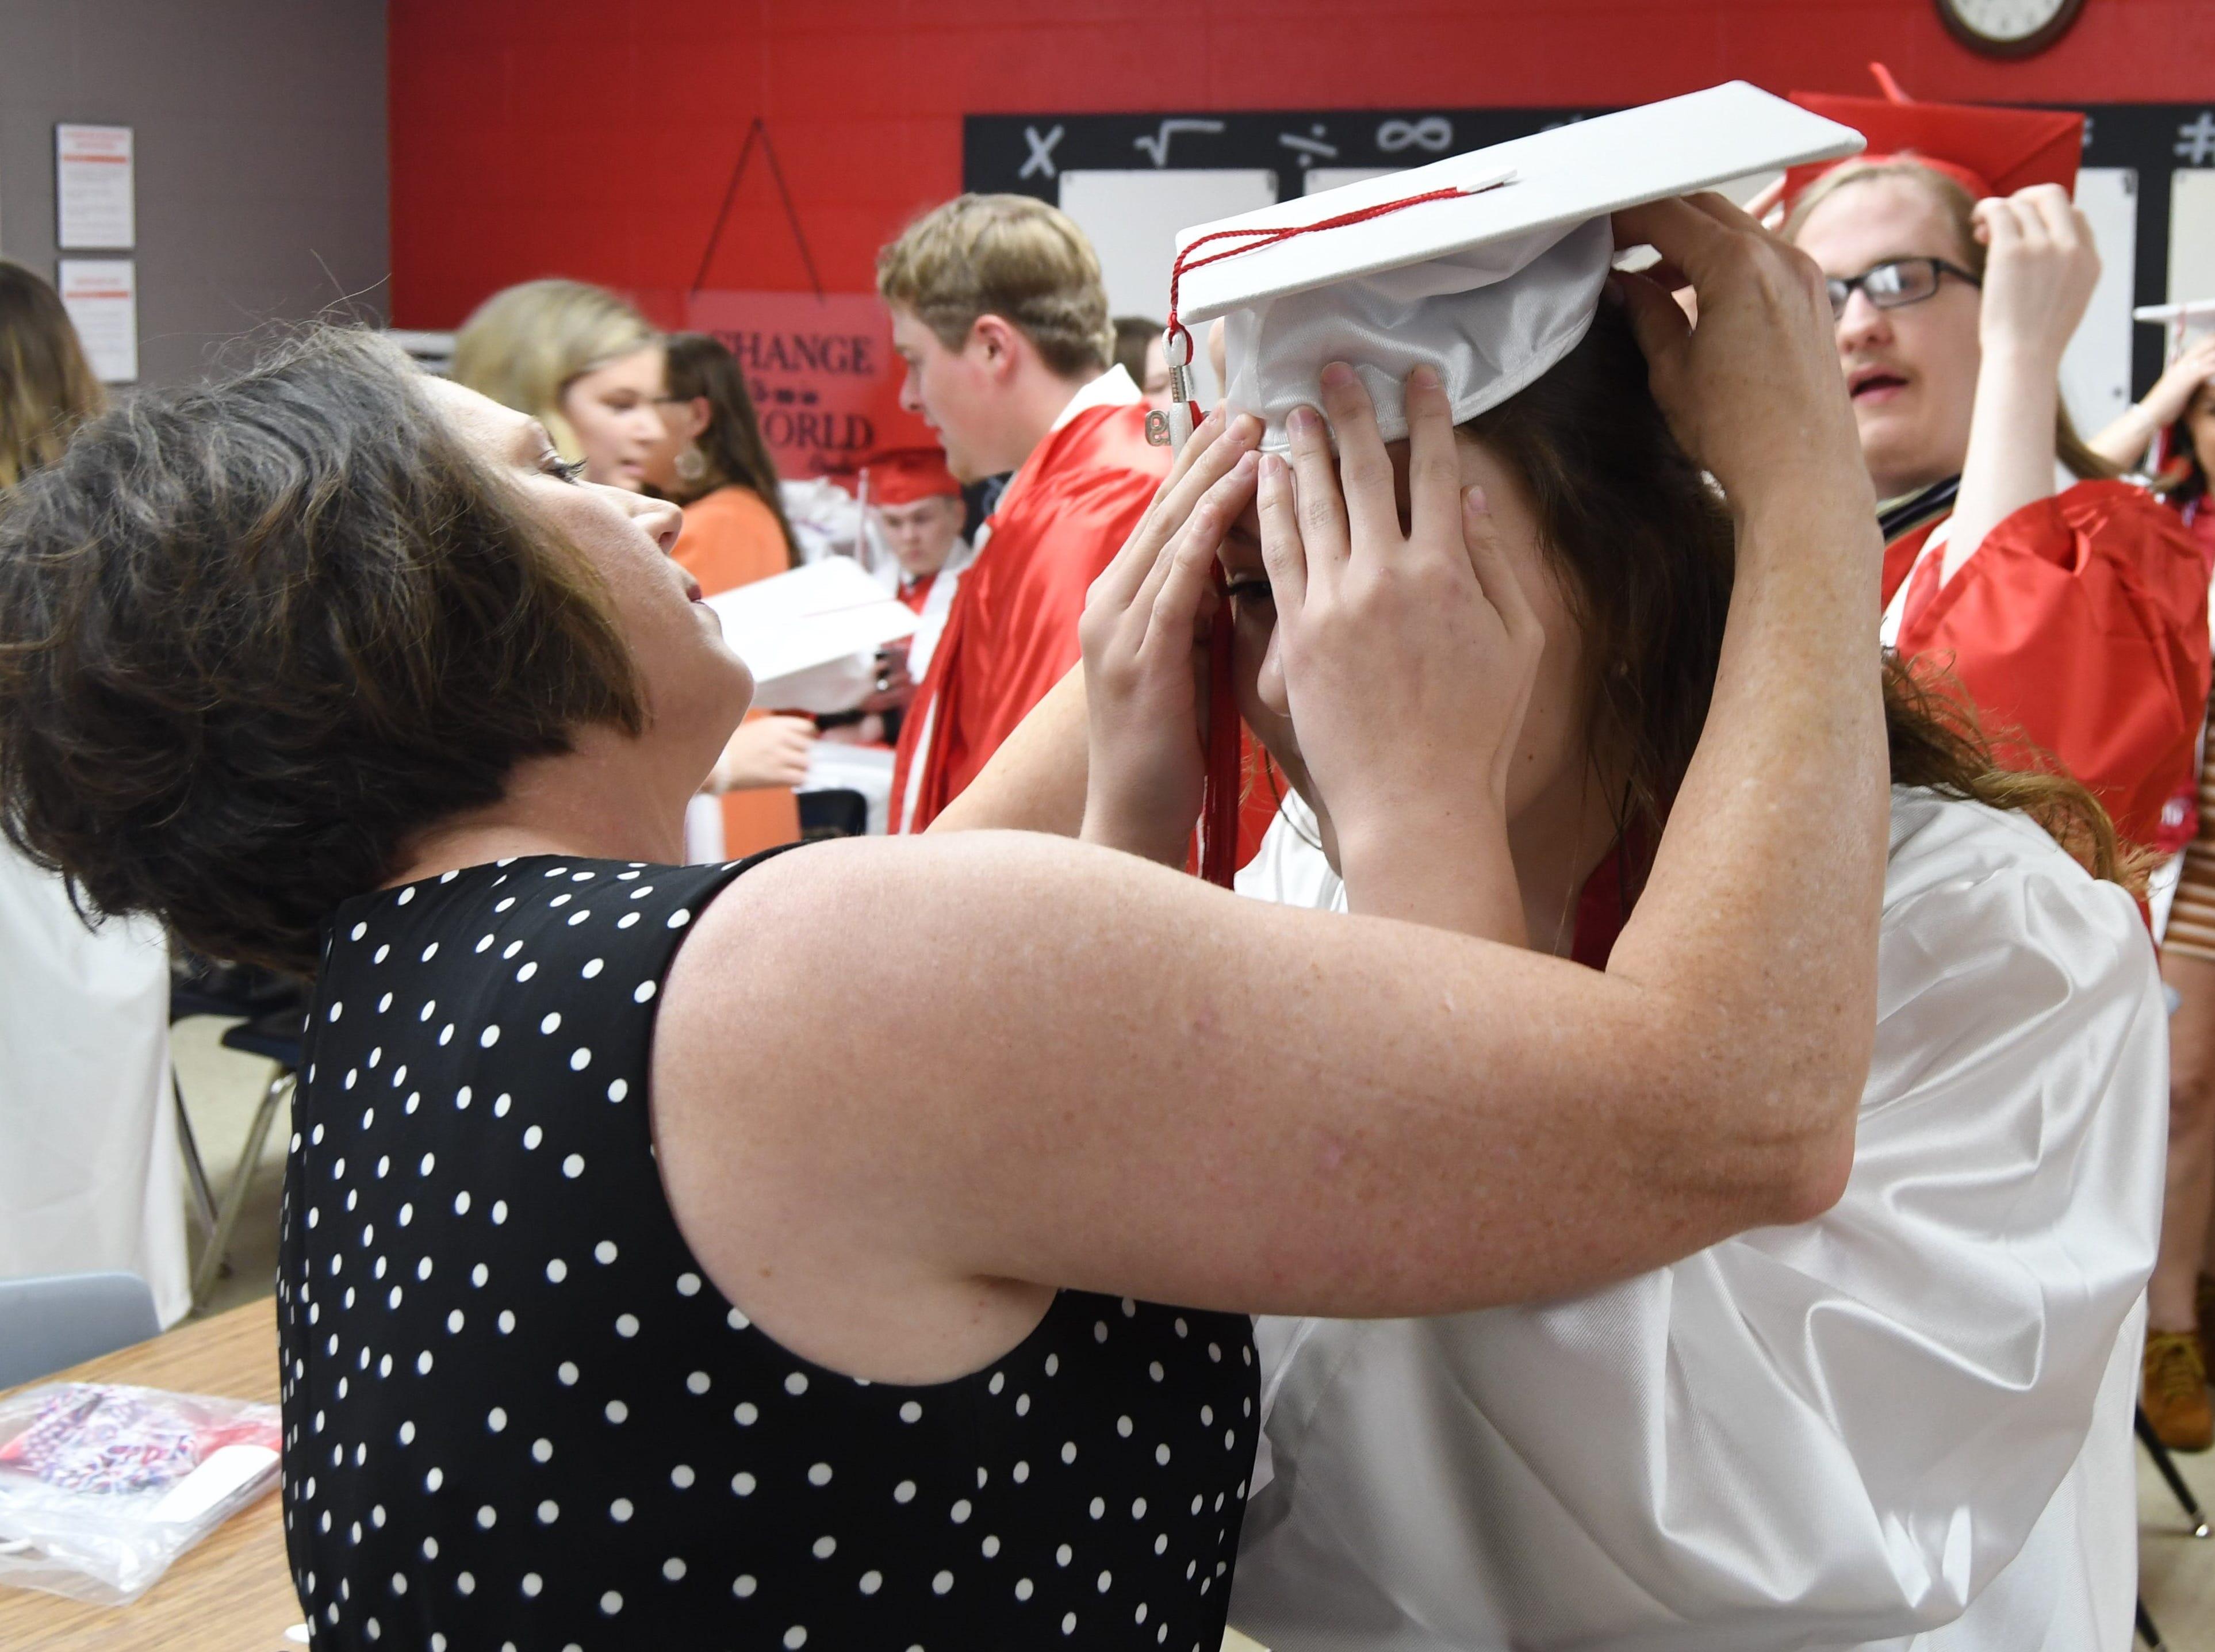 Senior class sponsor Gina Riggs helps a Flippin senior adjust her cap before Friday night's graduation.